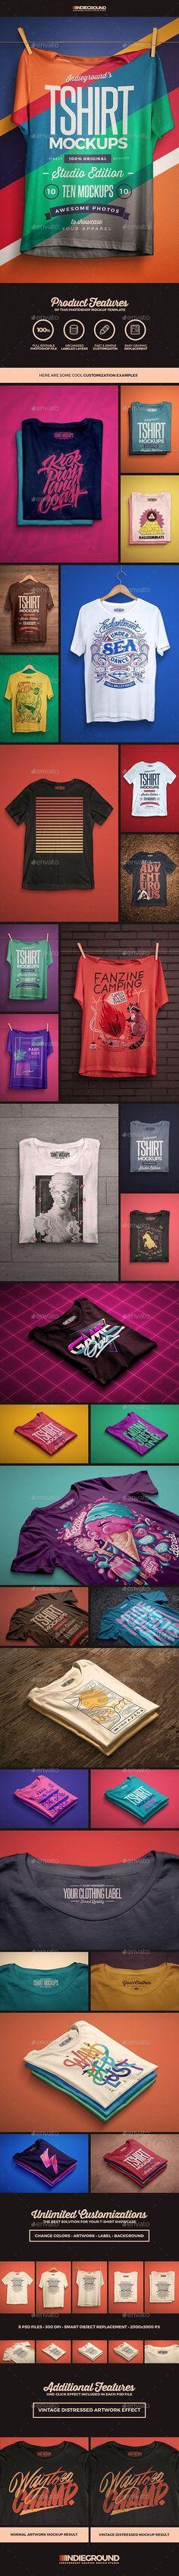 Studio T-shirt Mockups